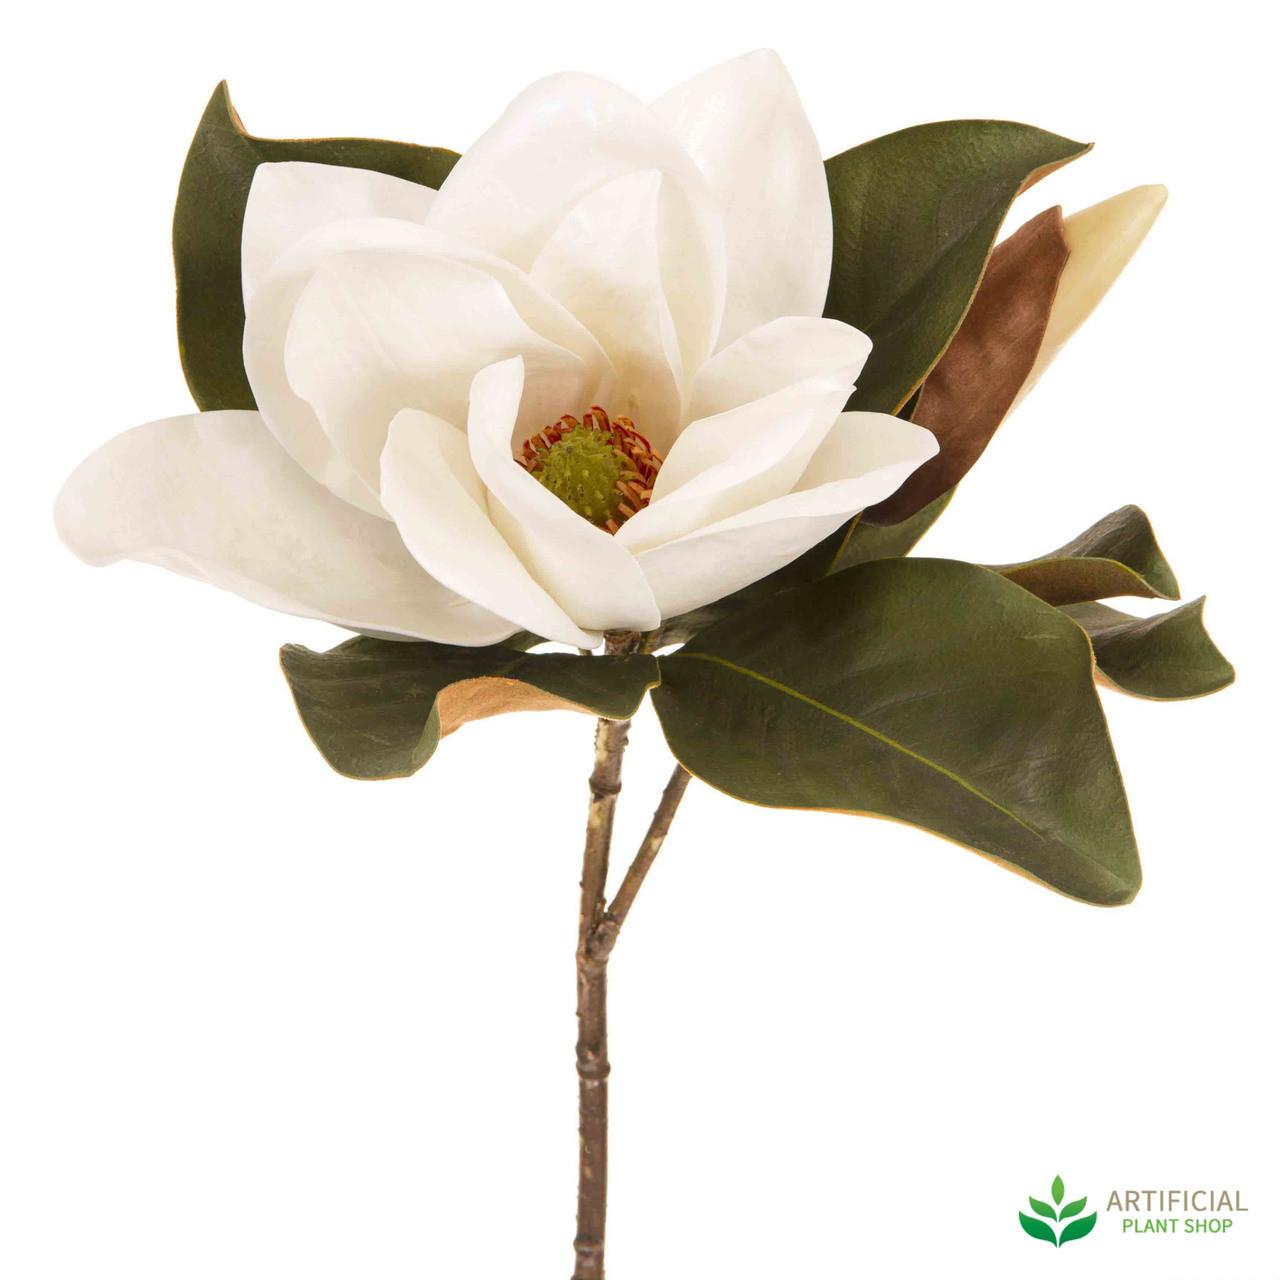 White magnolia flower 72cm image 1 mightylinksfo